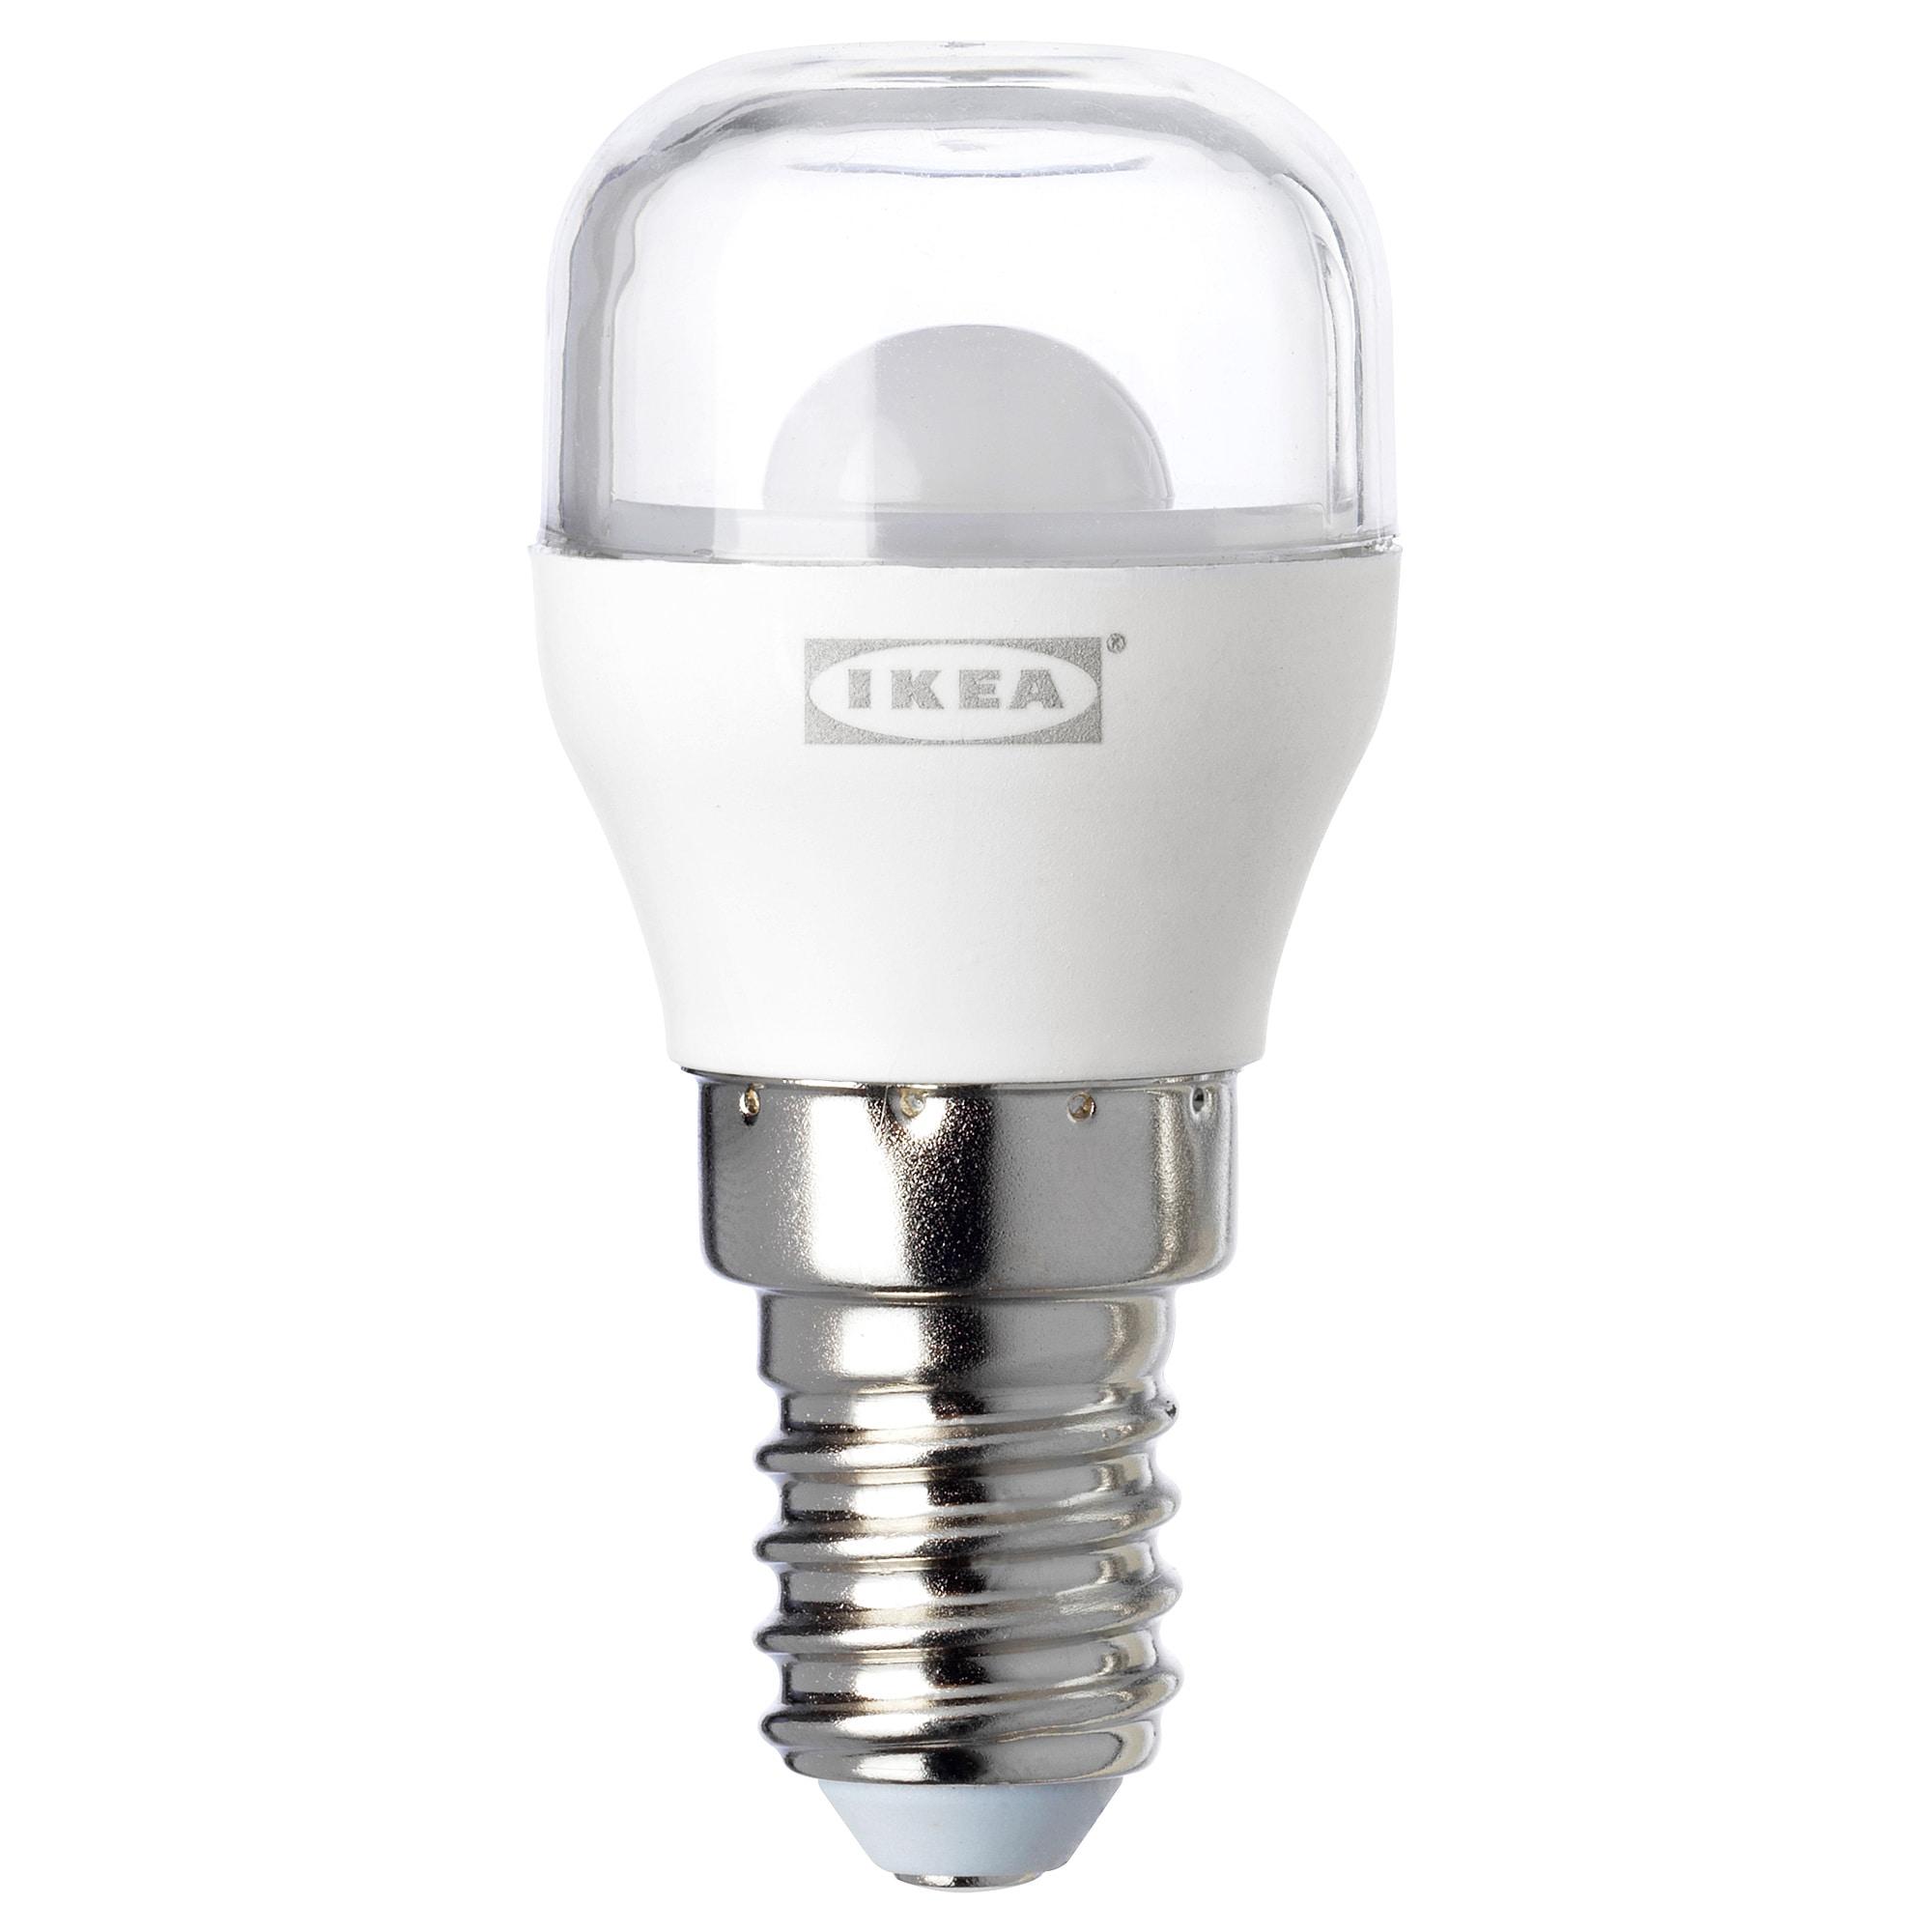 Us Furniture And Home Furnishings Ikea Beleuchtung Led Lichtstreifen Lichtleiste